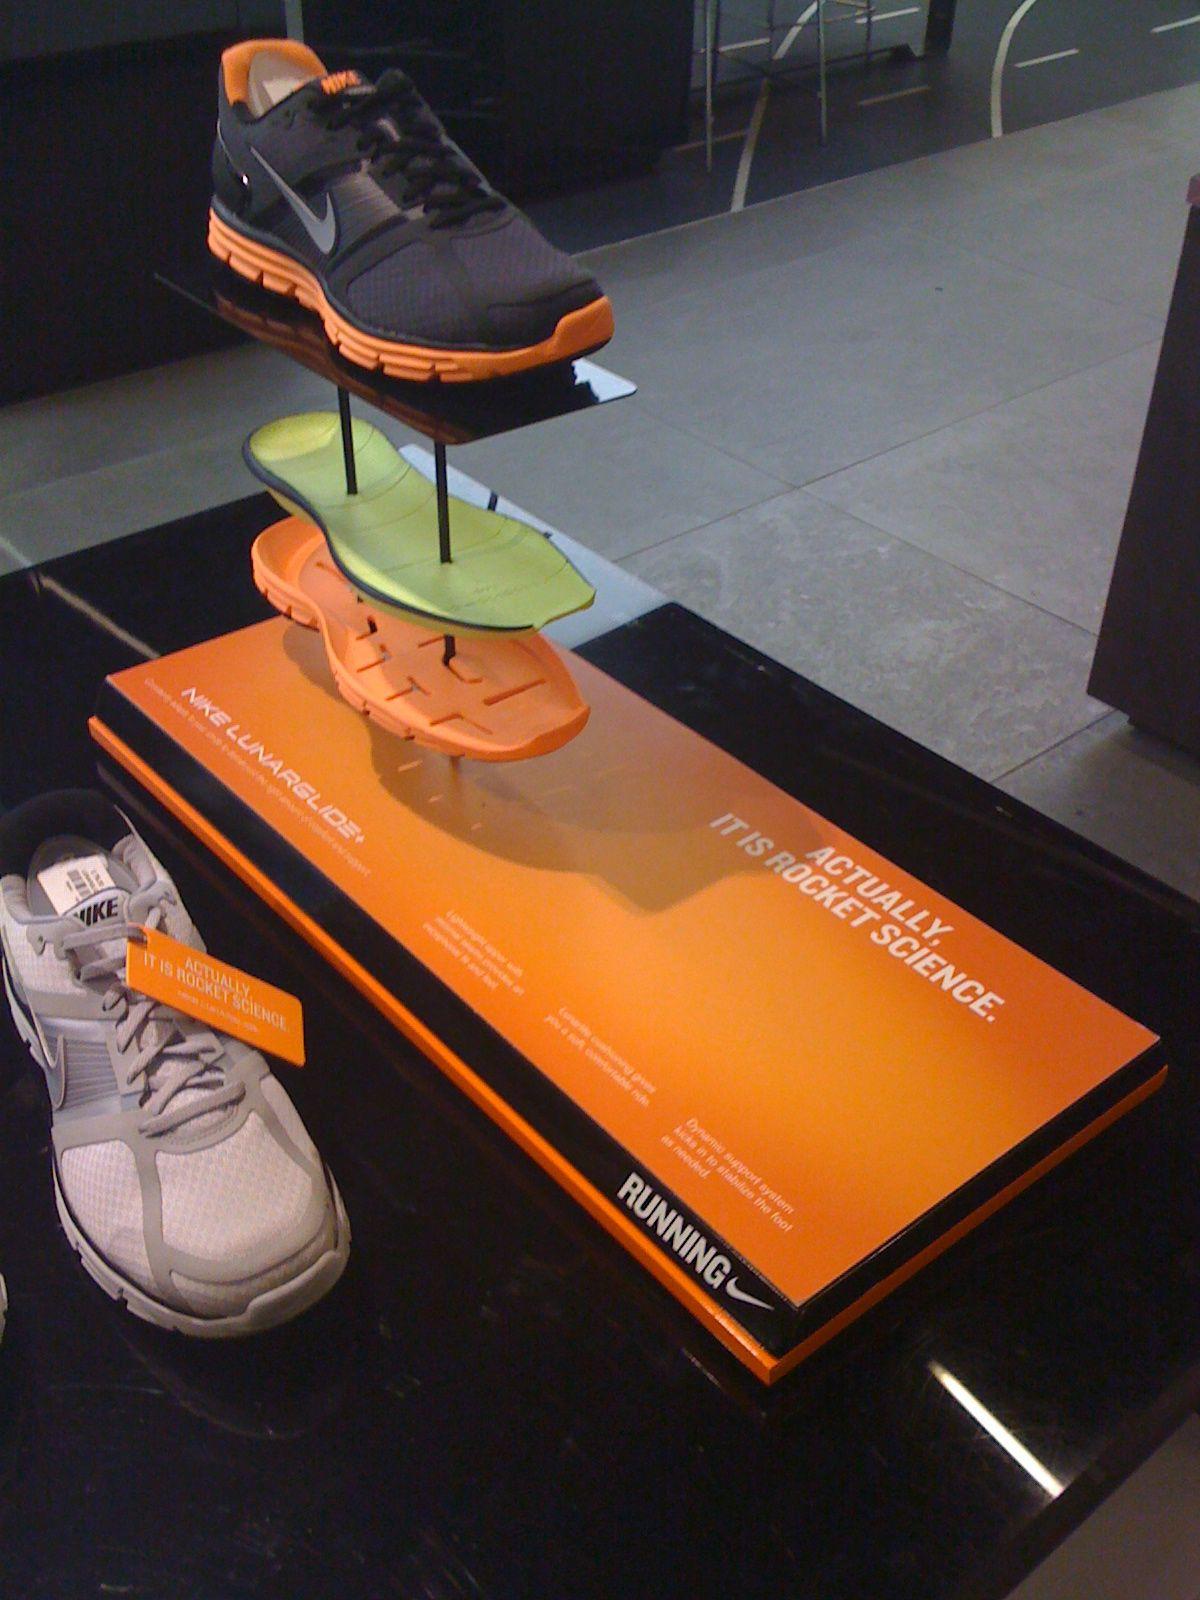 Pin by Caitlin Joyce on Retail Crush | Shoe box cake, Shoe